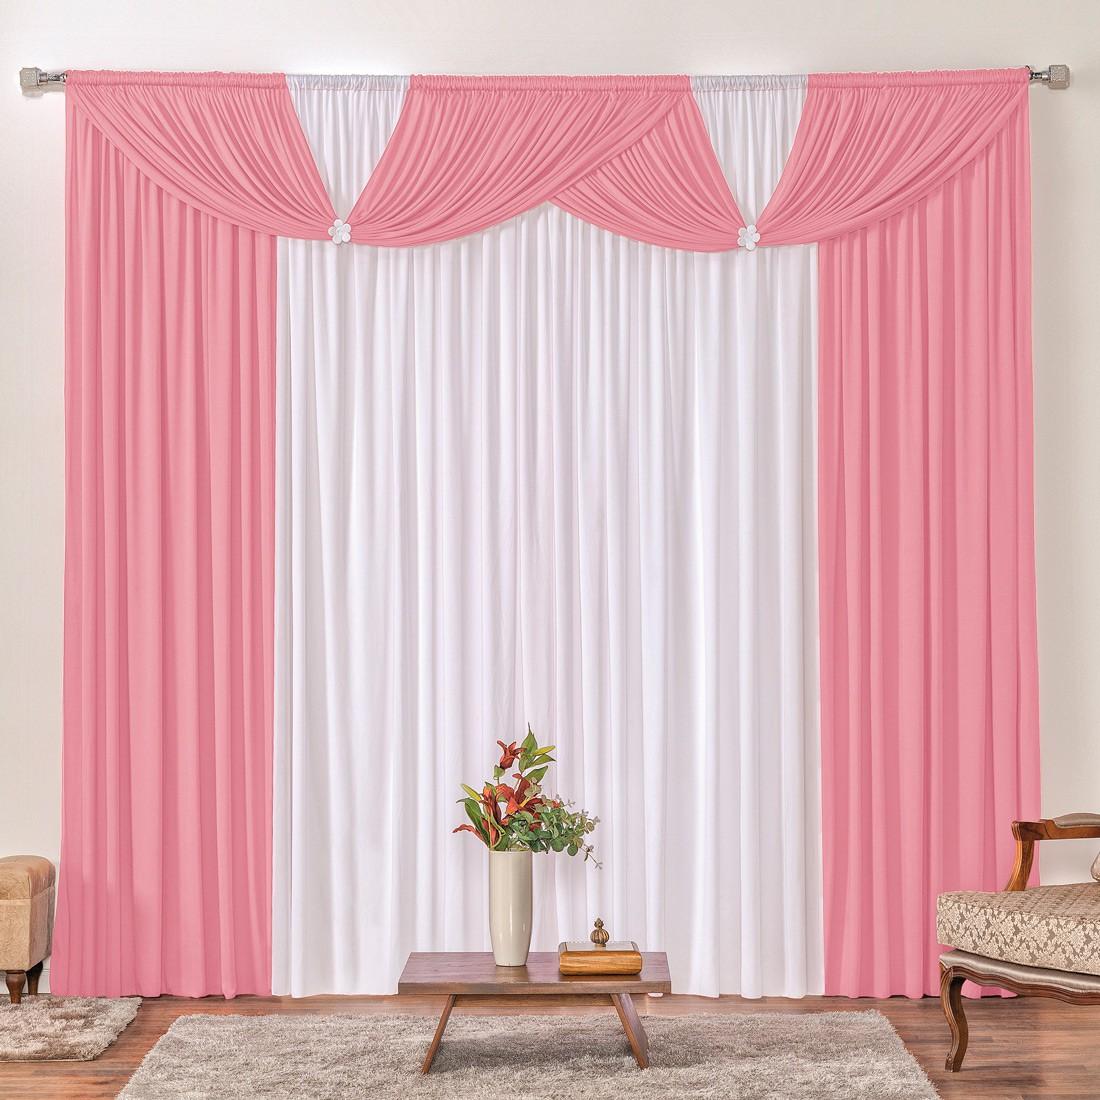 Cortina Londrina Rosa/Branco 2,00m X 1,70m p/ Varão Simples